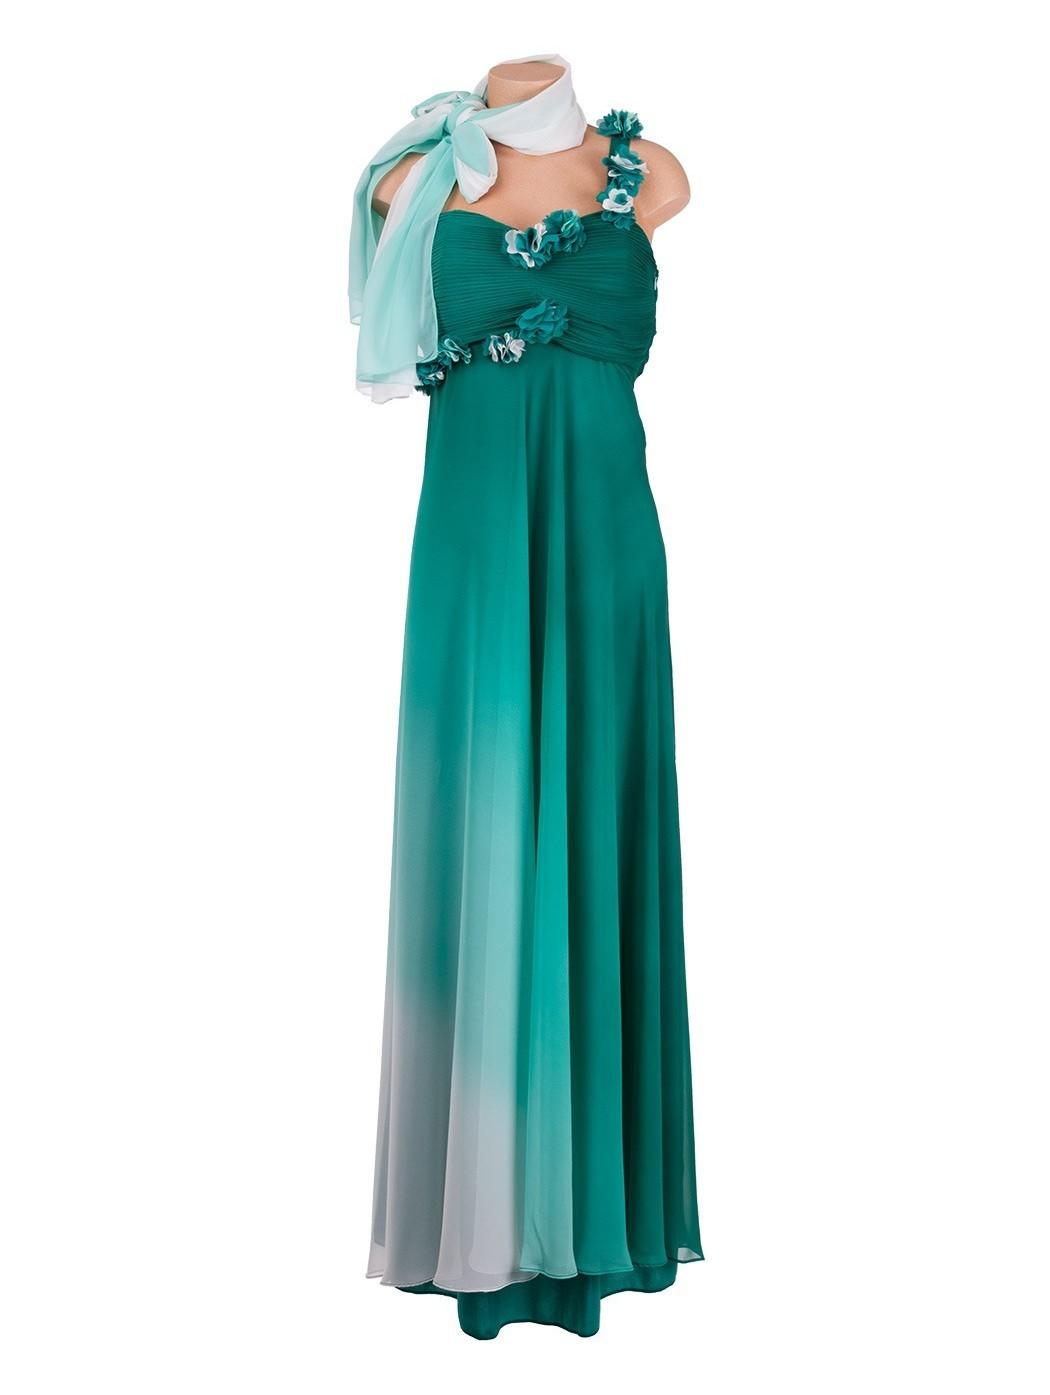 Luca Giordani one shoulder dress